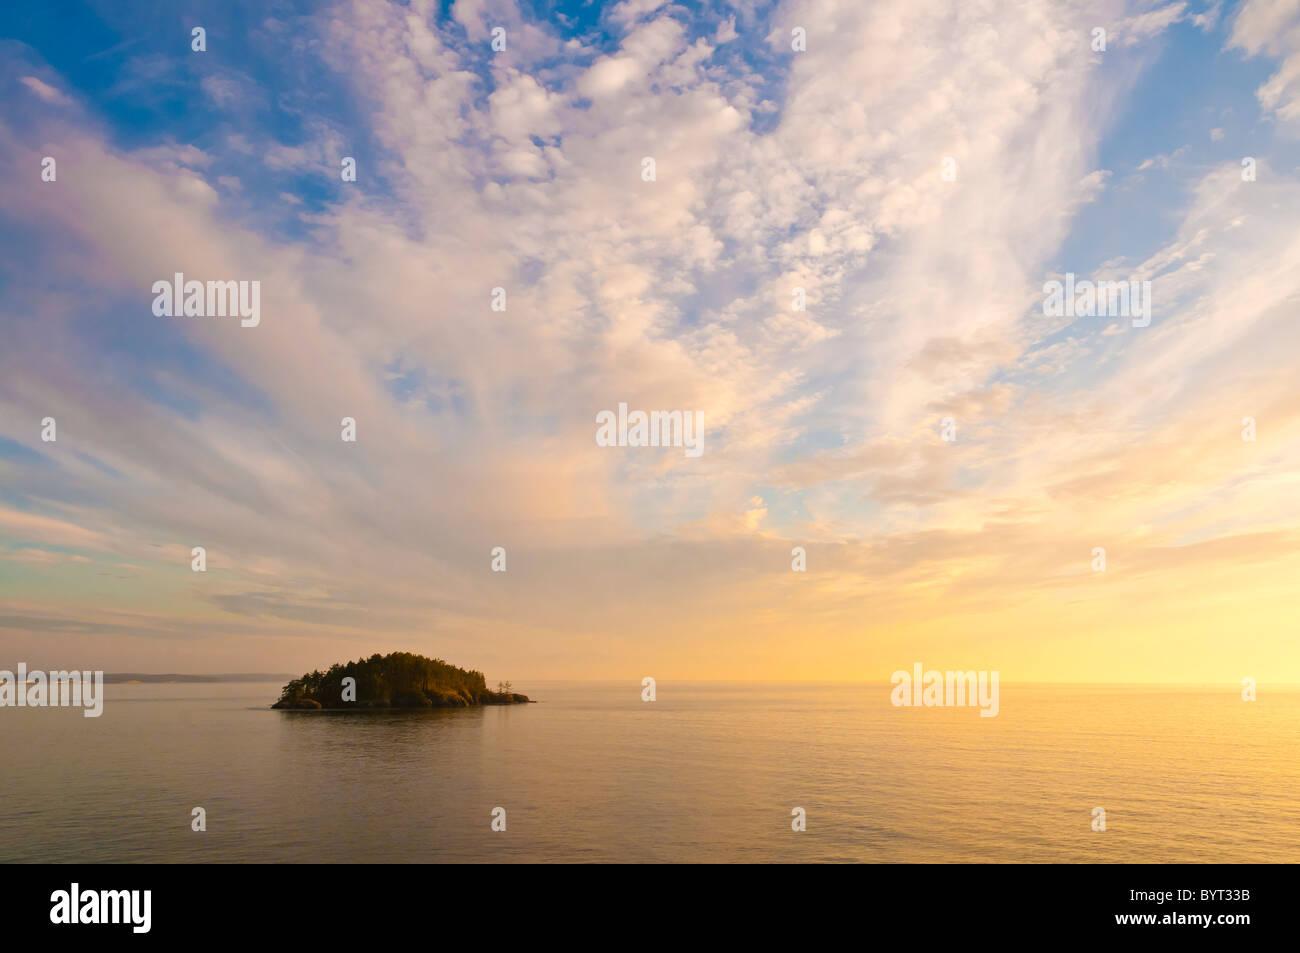 Deception Island from Rosario Head, Deception Pass State Park, Fidalgo Island, Washington. - Stock Image